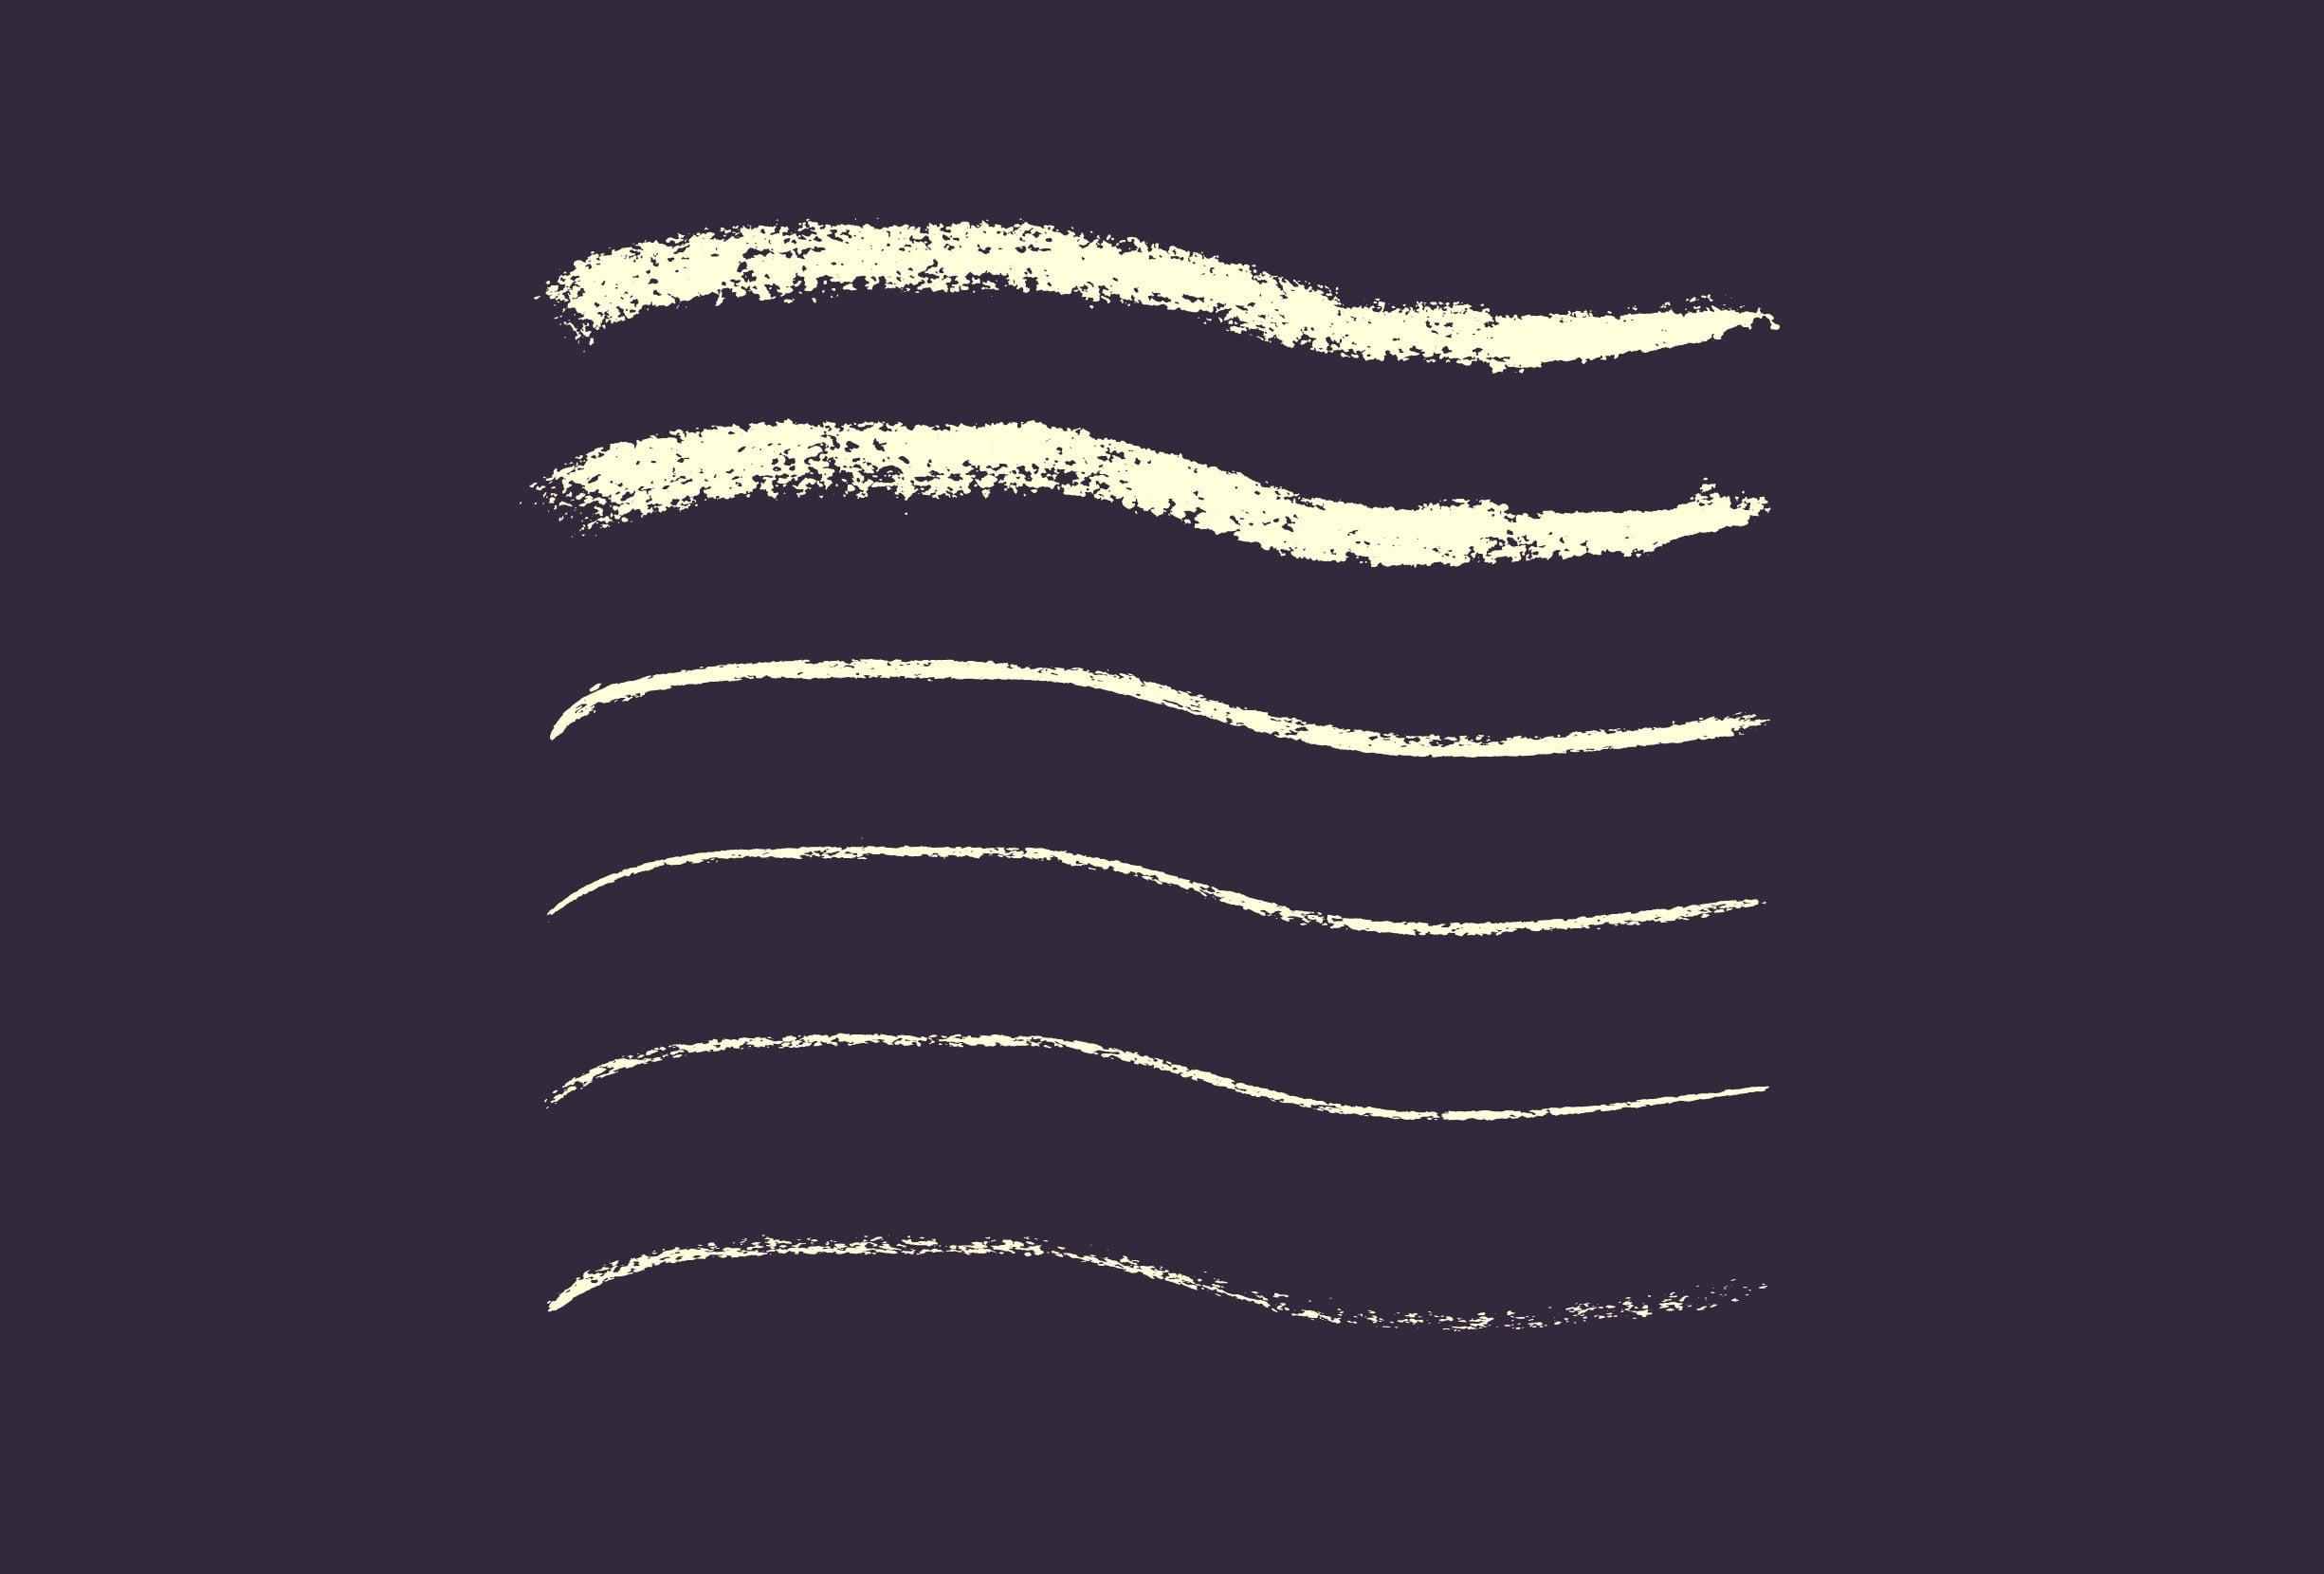 30 Best Line Art Illustrator Brushes (Wax Crayons) - brushes presentation 0 0